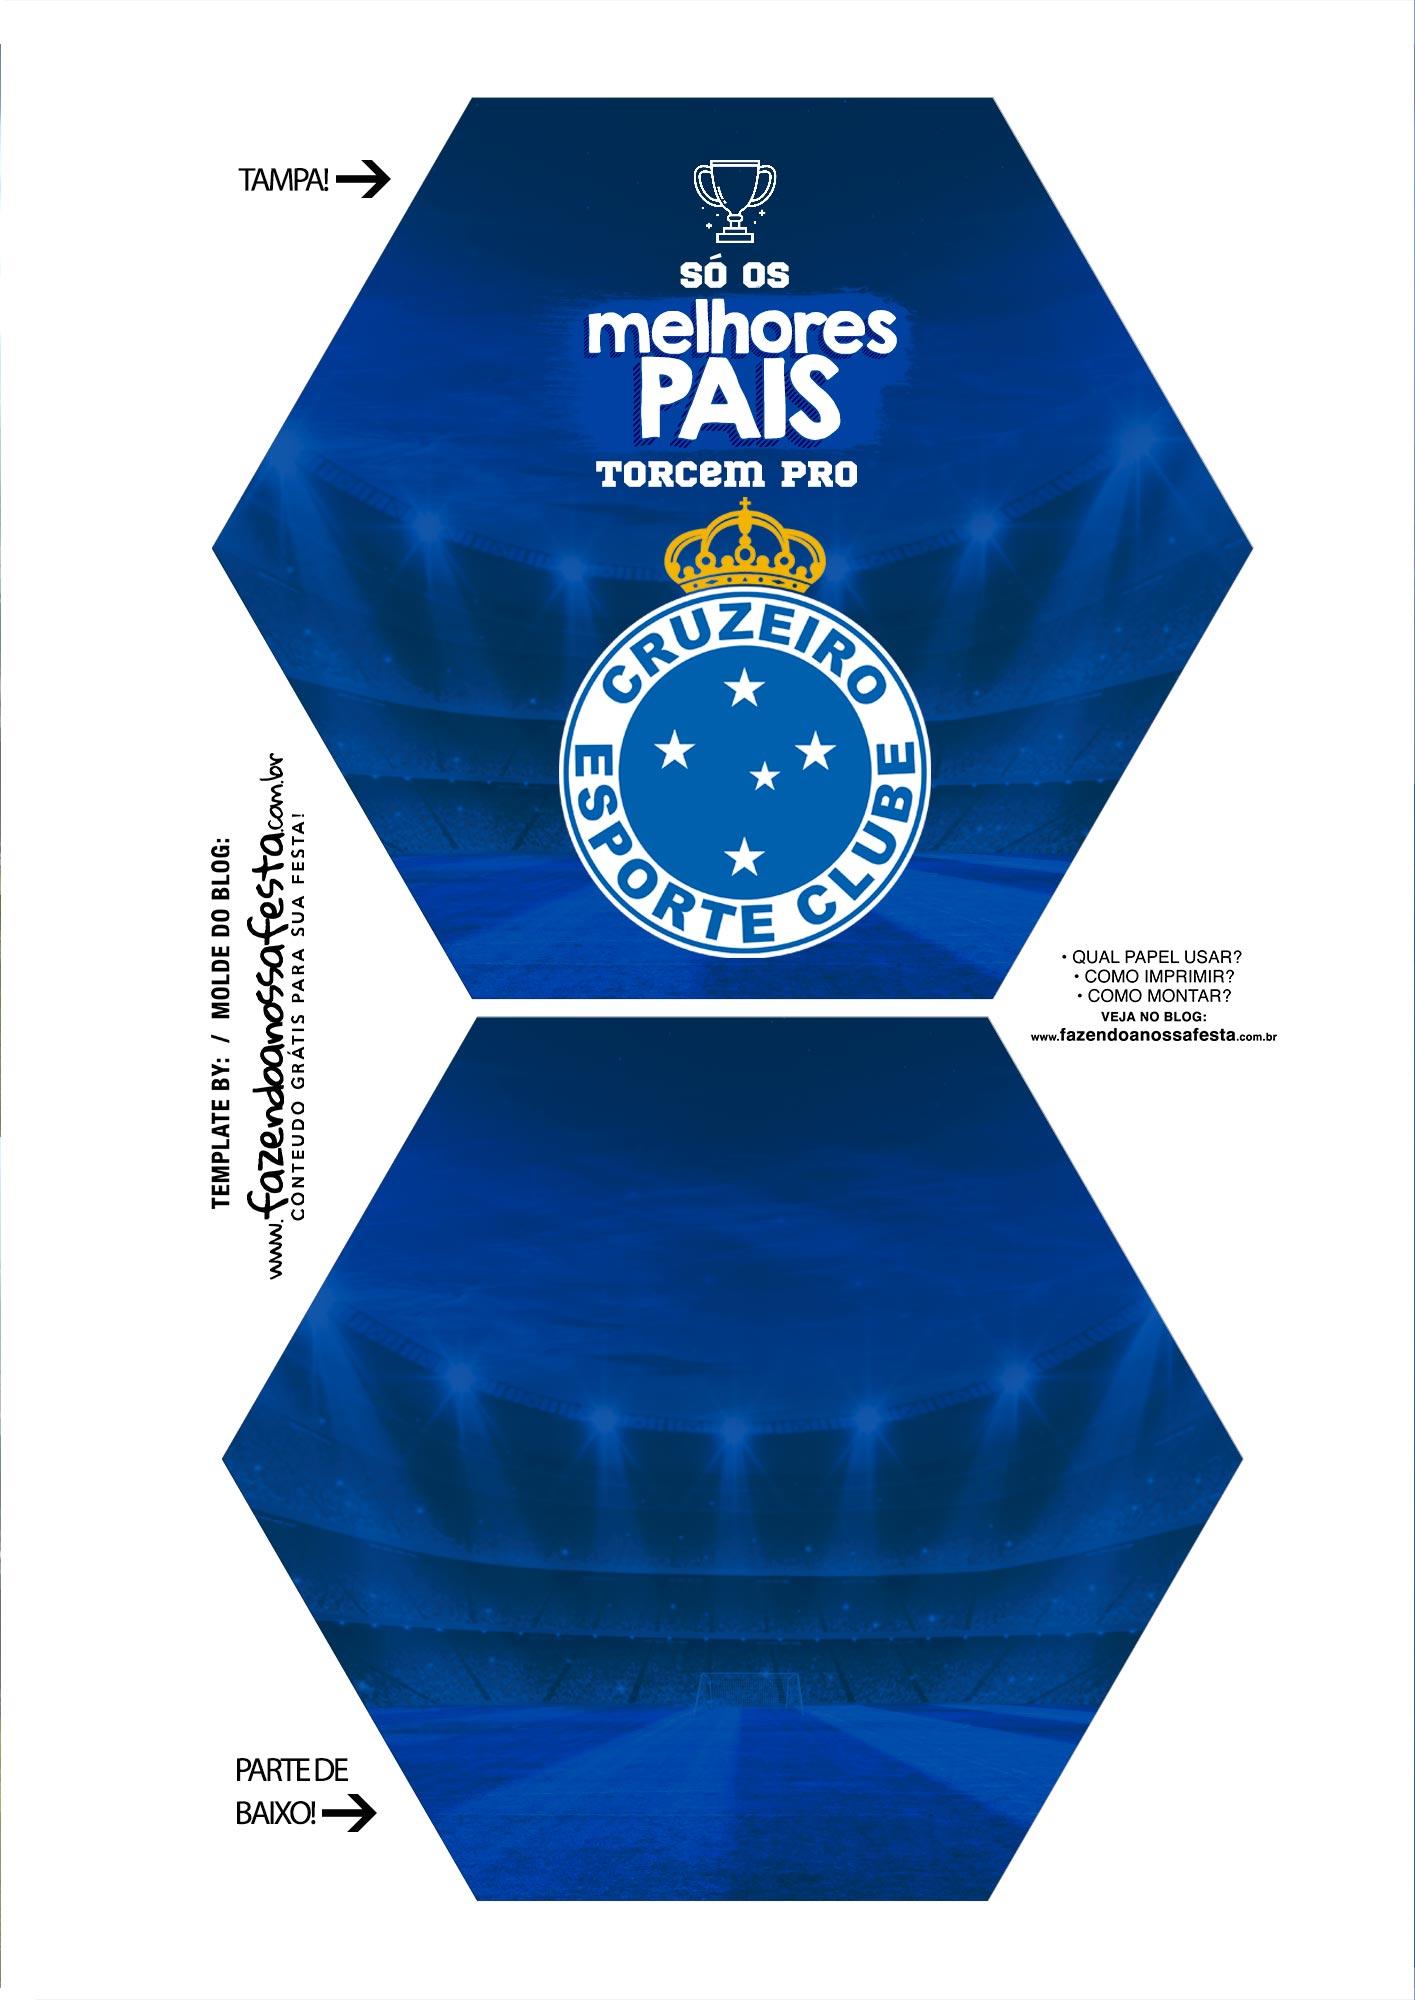 Caixa Explosiva Parte 1 Cruzeiro